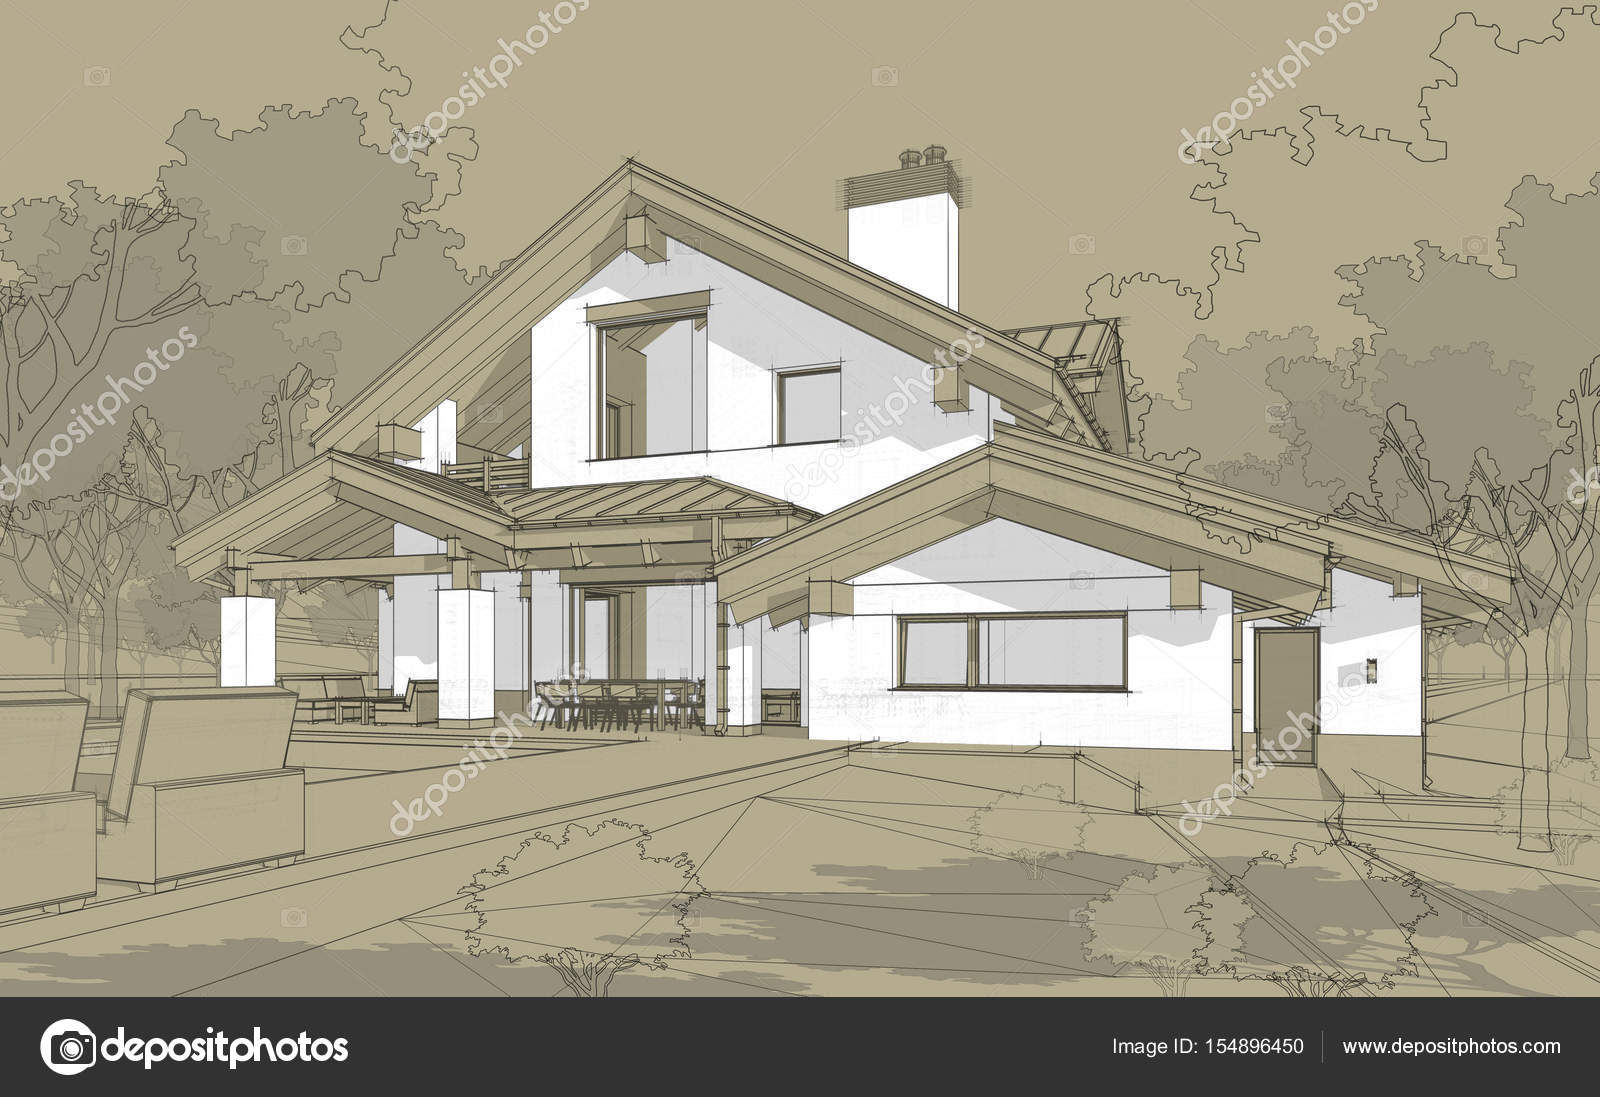 D render schets van gezellige stadsvilla in chalet stijl